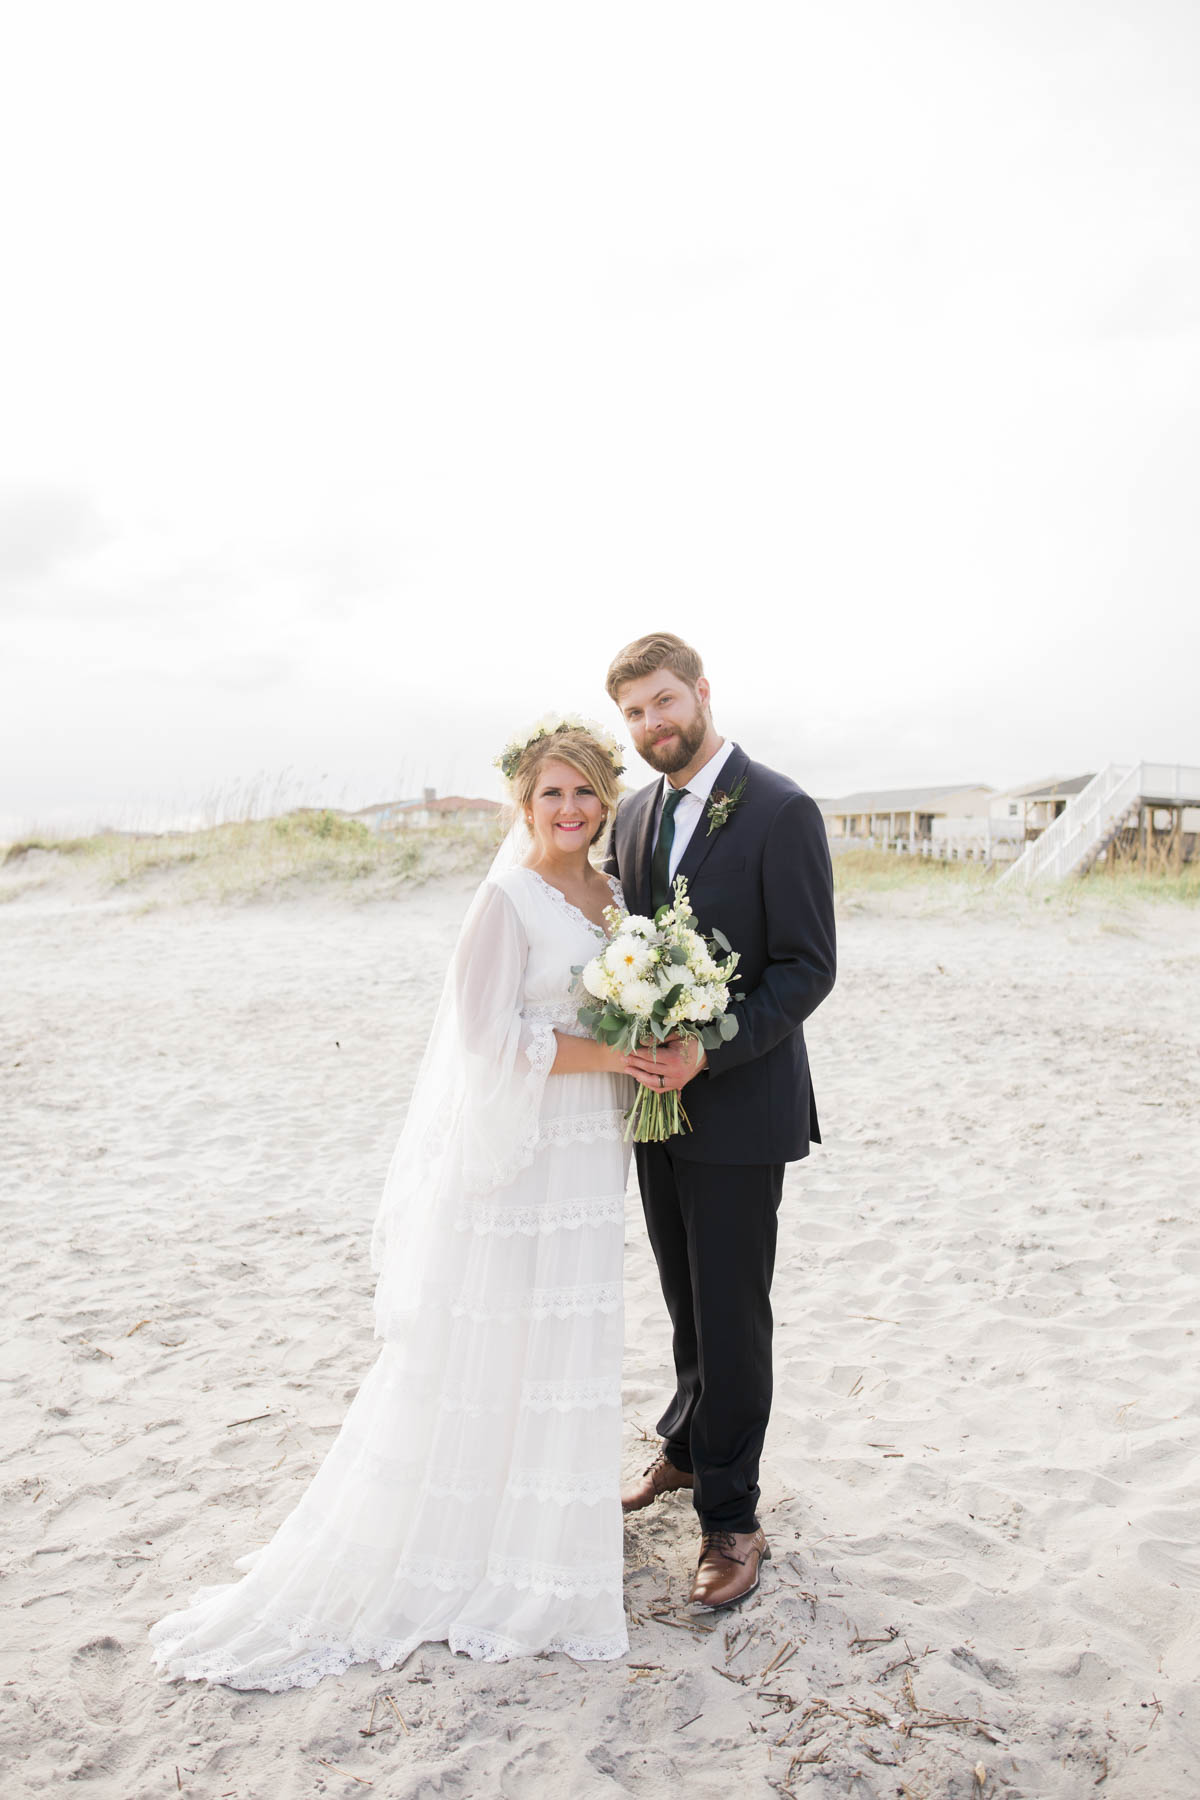 shotbychelsea_wedding_blog-40.jpg